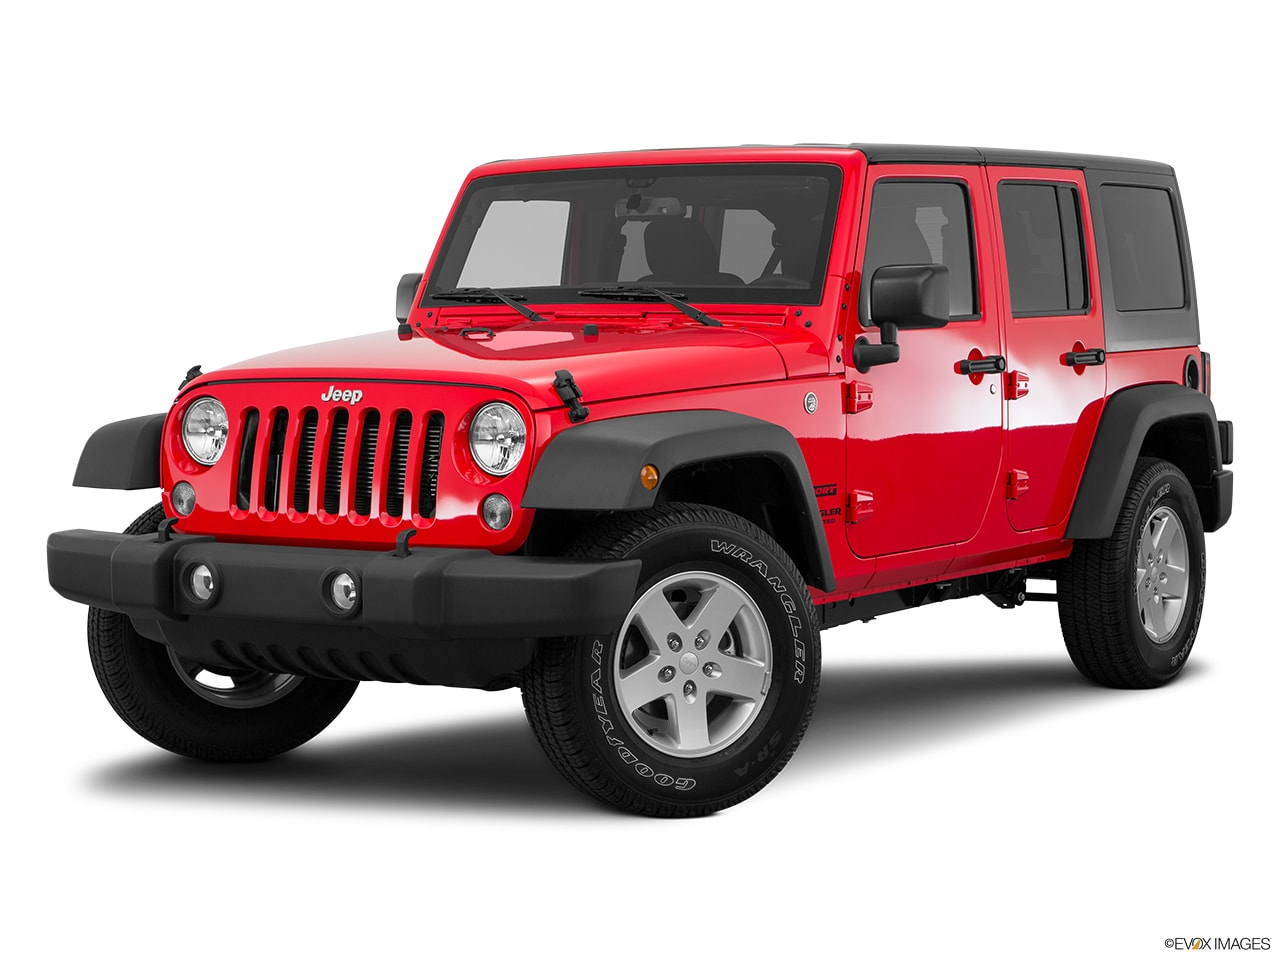 Jeep Wrangler Lease >> Jeep Wrangler Lease Deal Elmwood Chrysler Dodge Jeep Ram 401